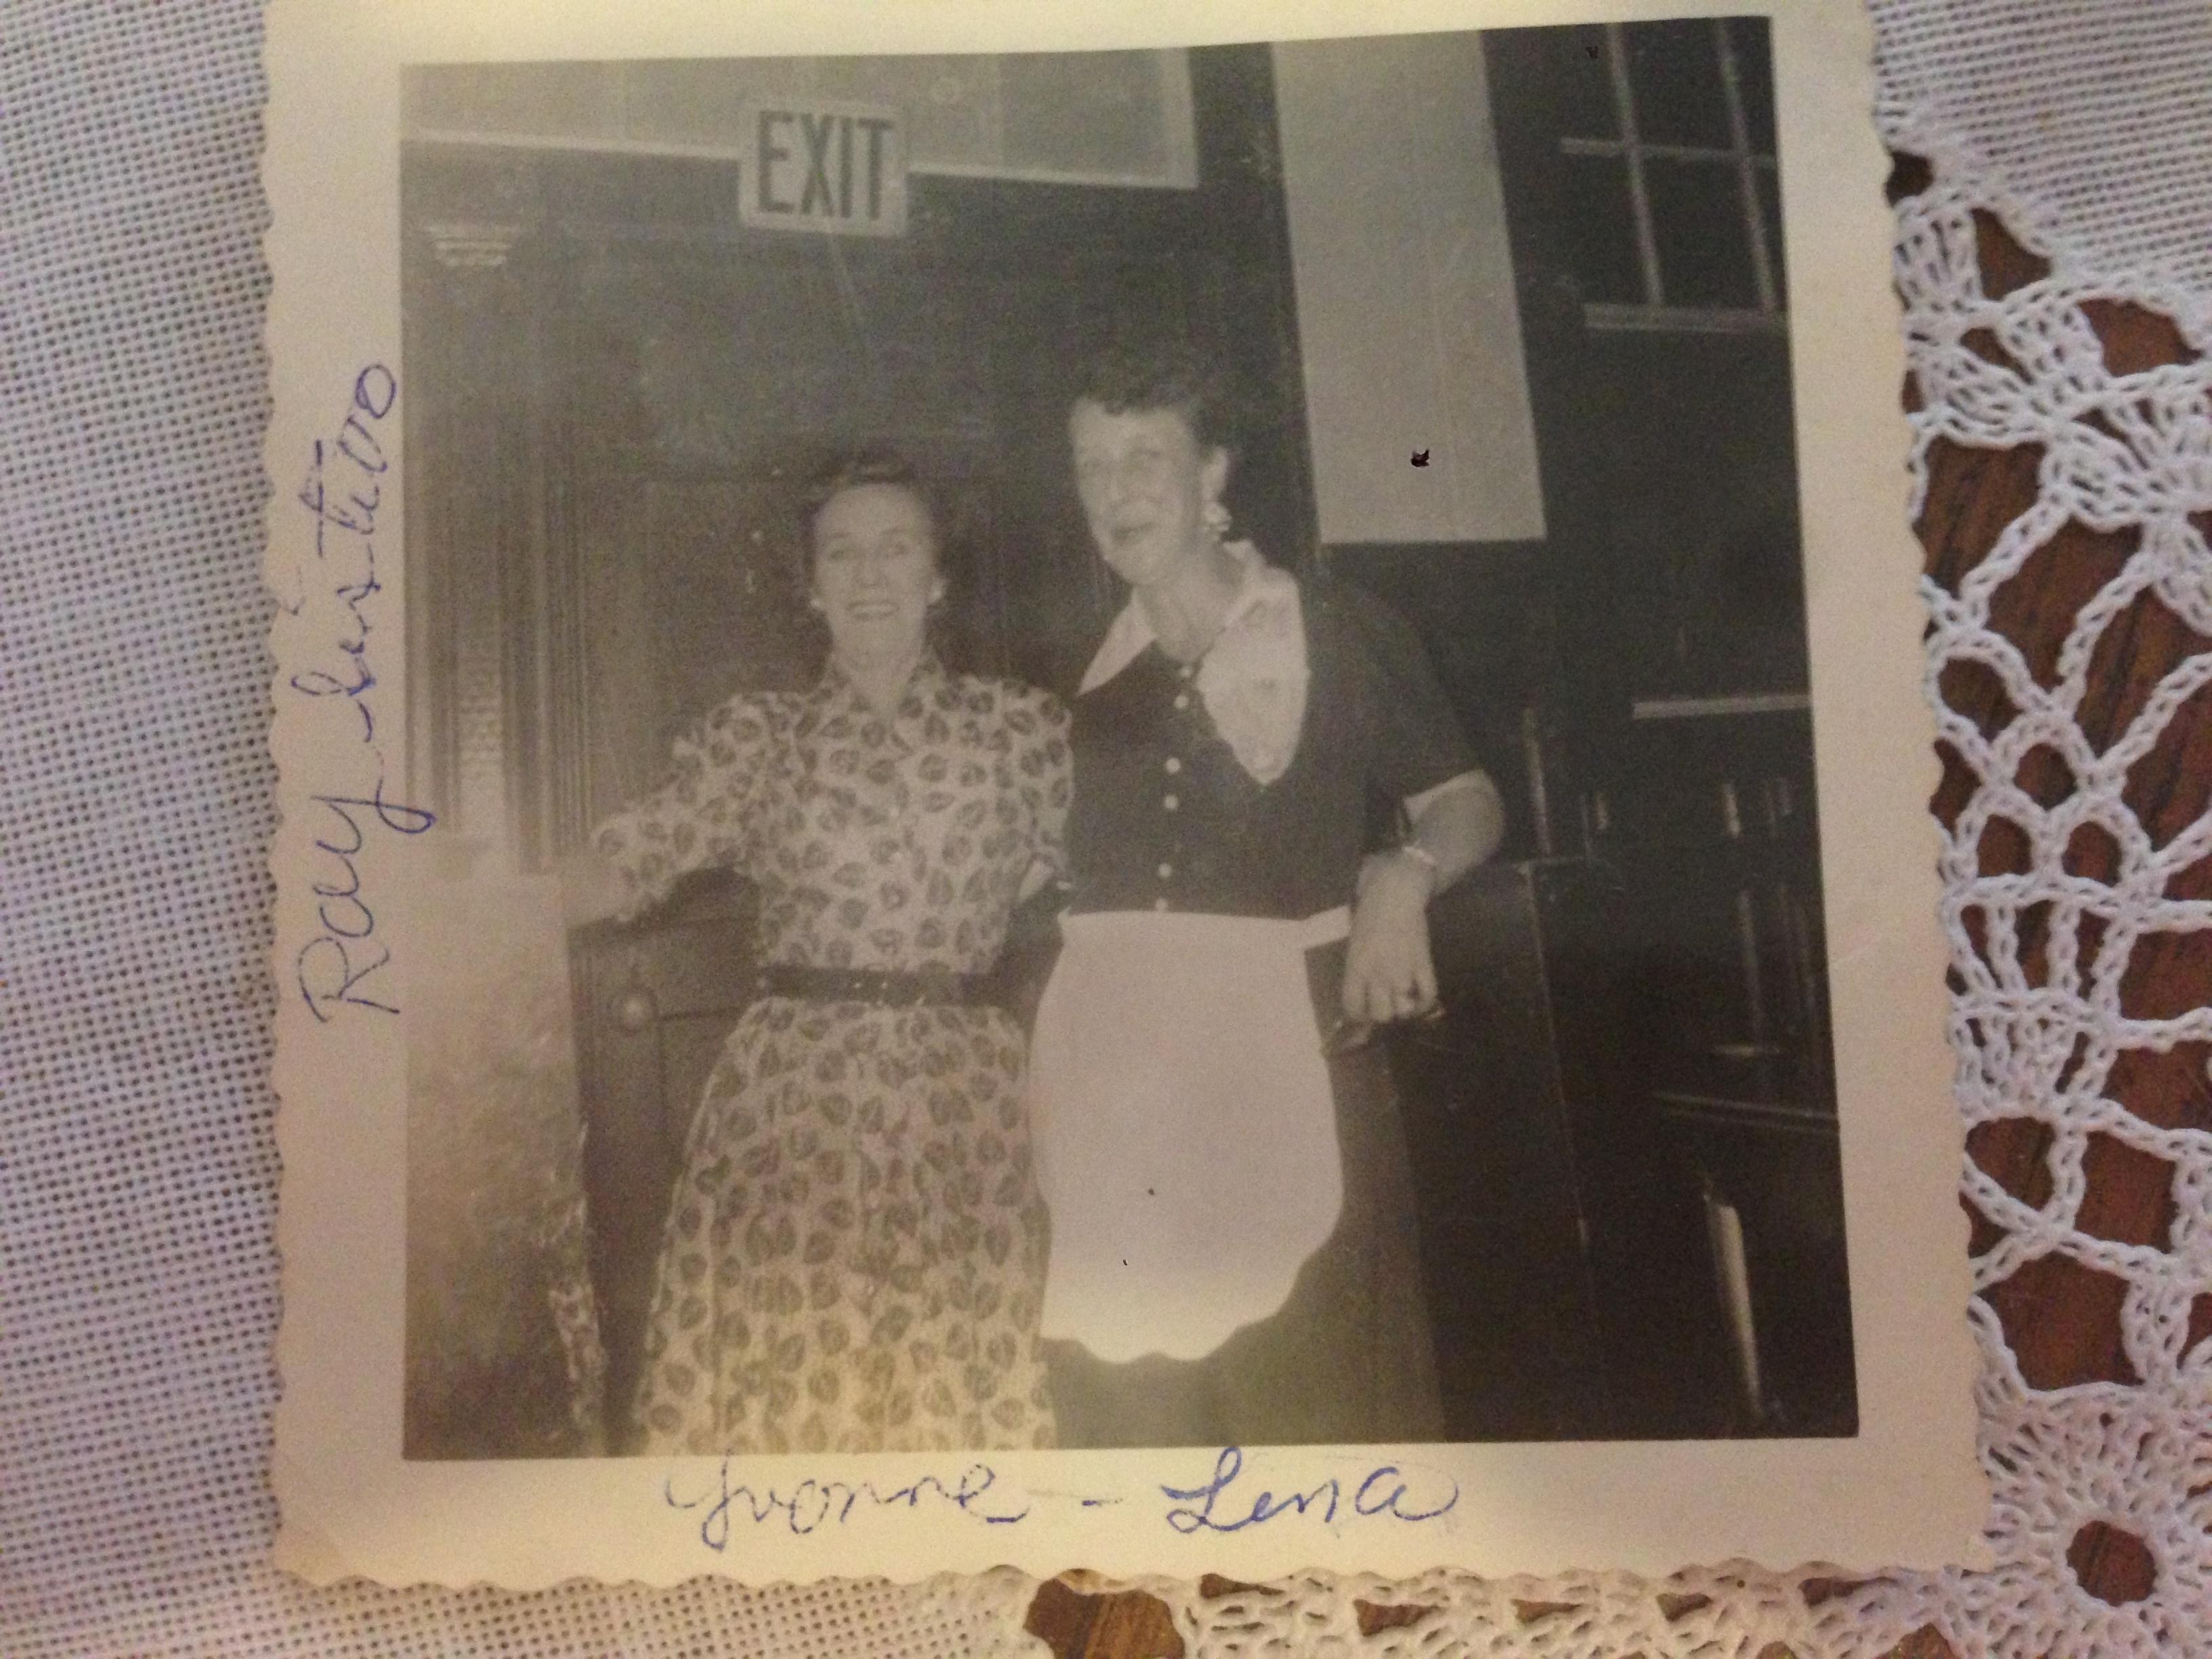 Lena with apron